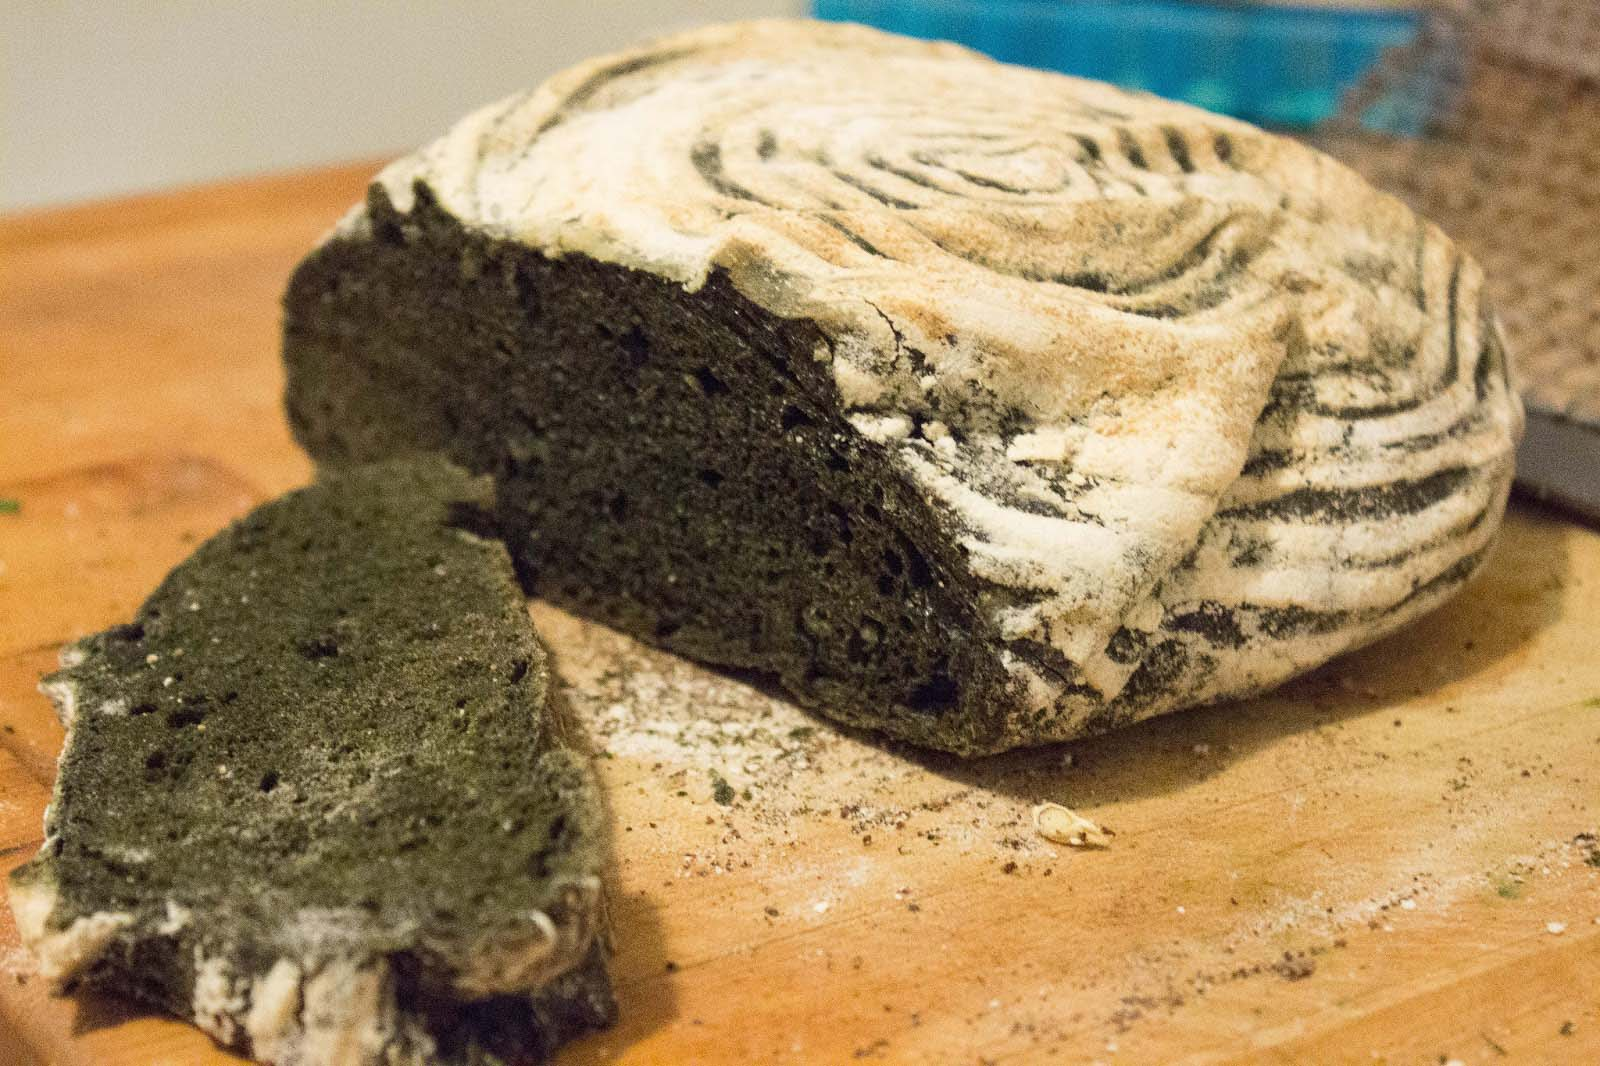 Bread with algae - Swansea, Wales